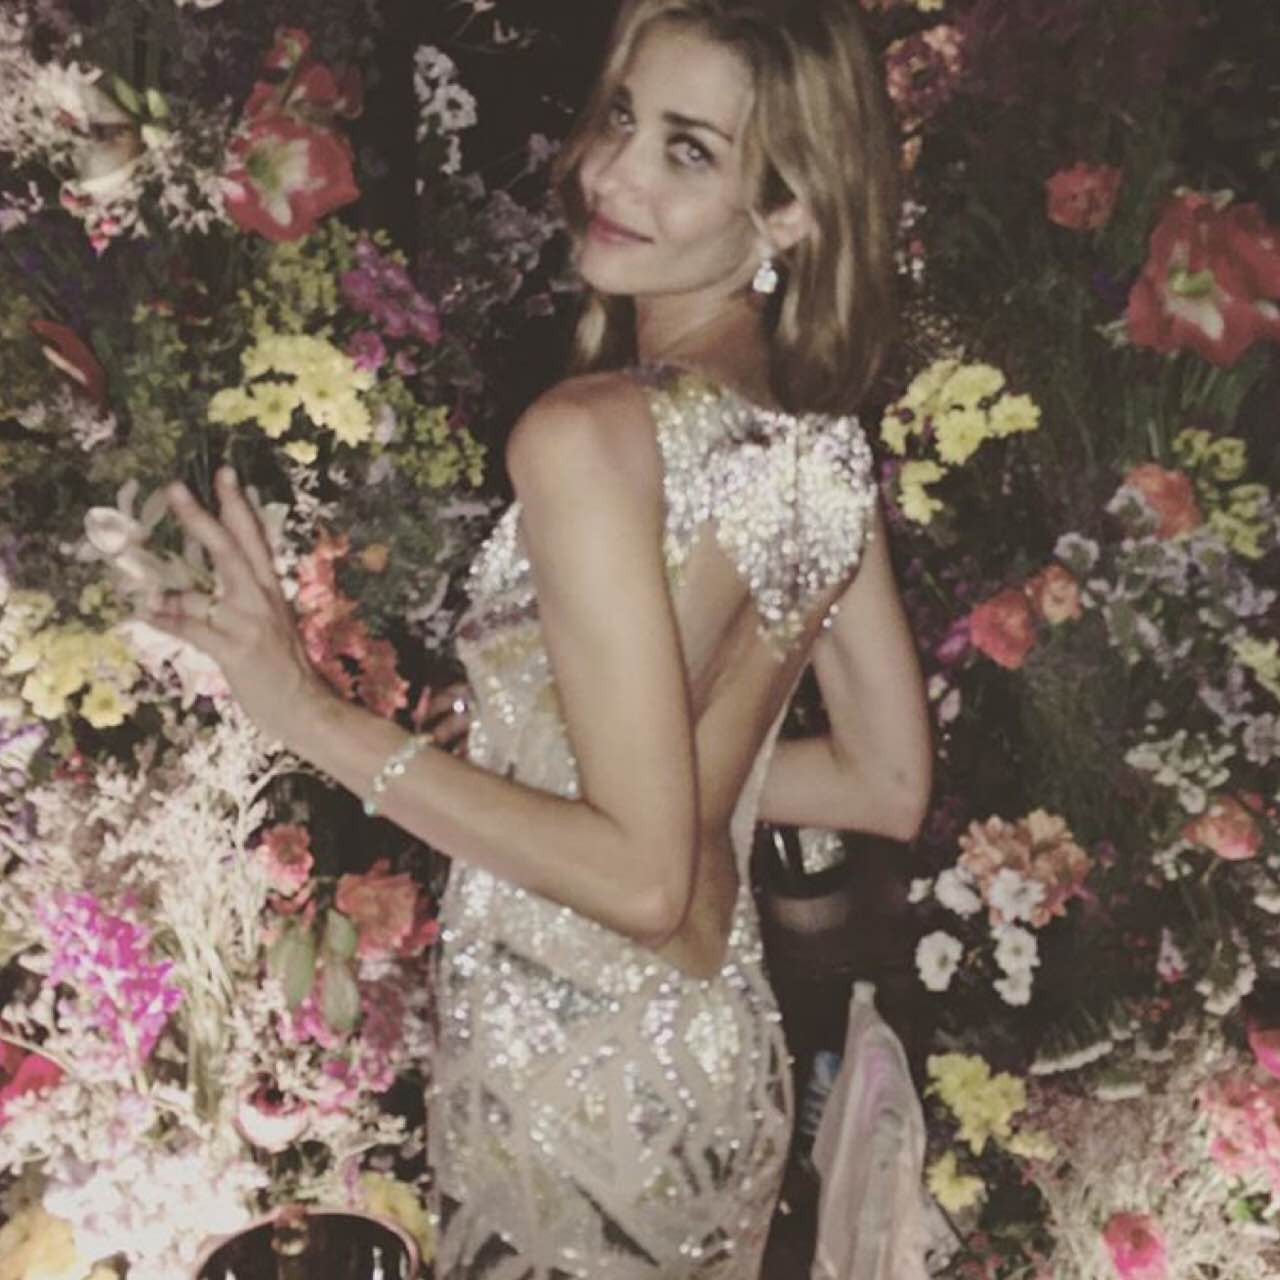 Ana-Beatriz-Barros-victorias-secret-angel-wedding